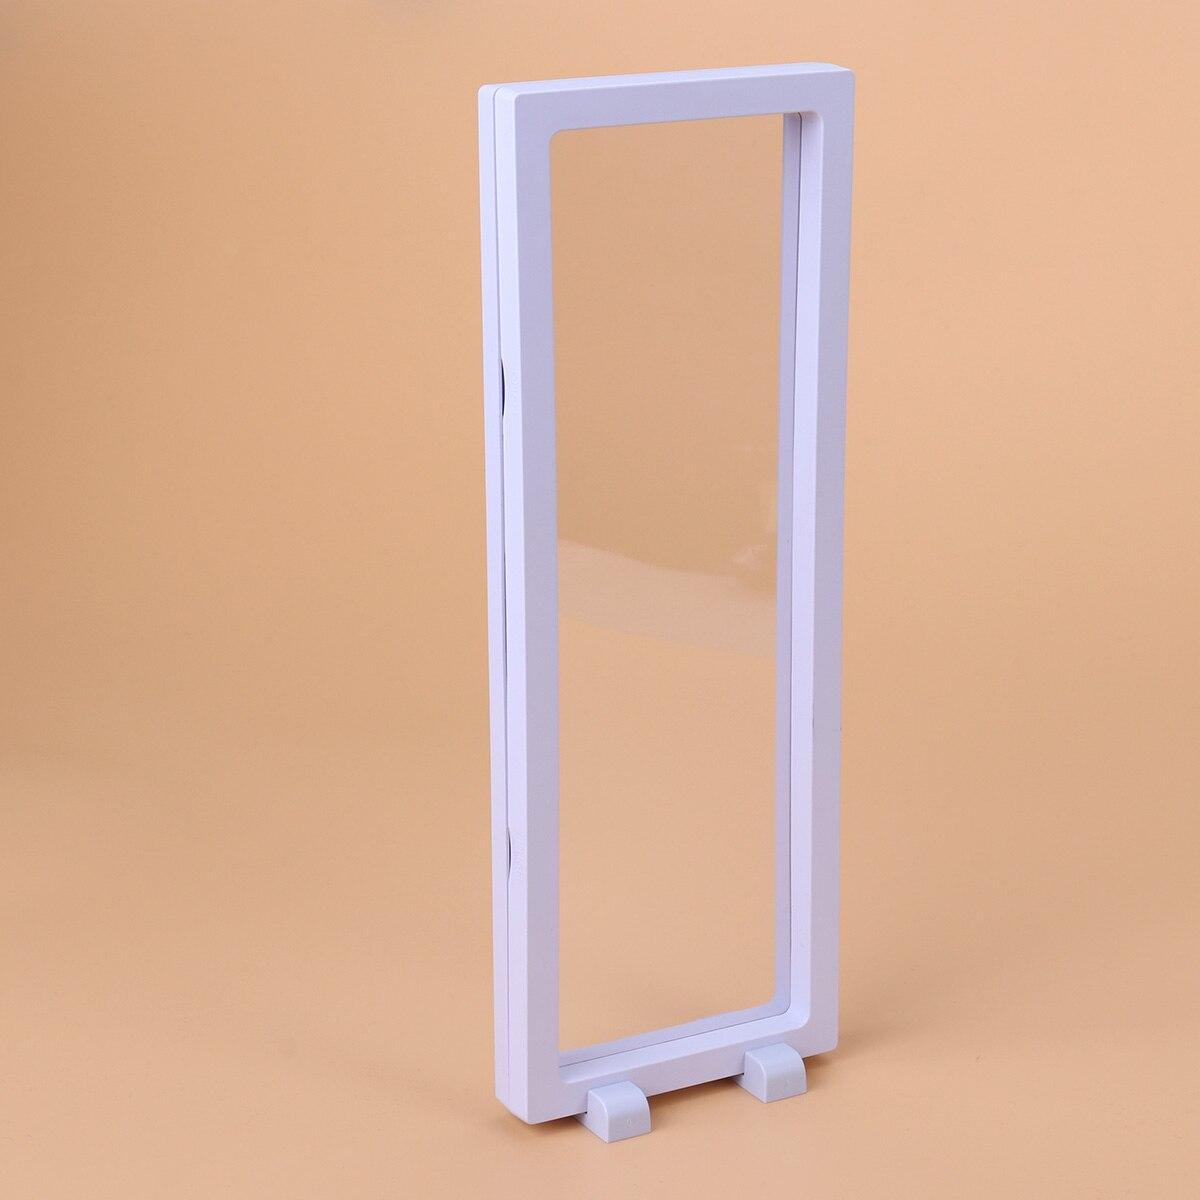 3D 11x30 cm flotante Marcos sombra caja vitrina moneda caja ...